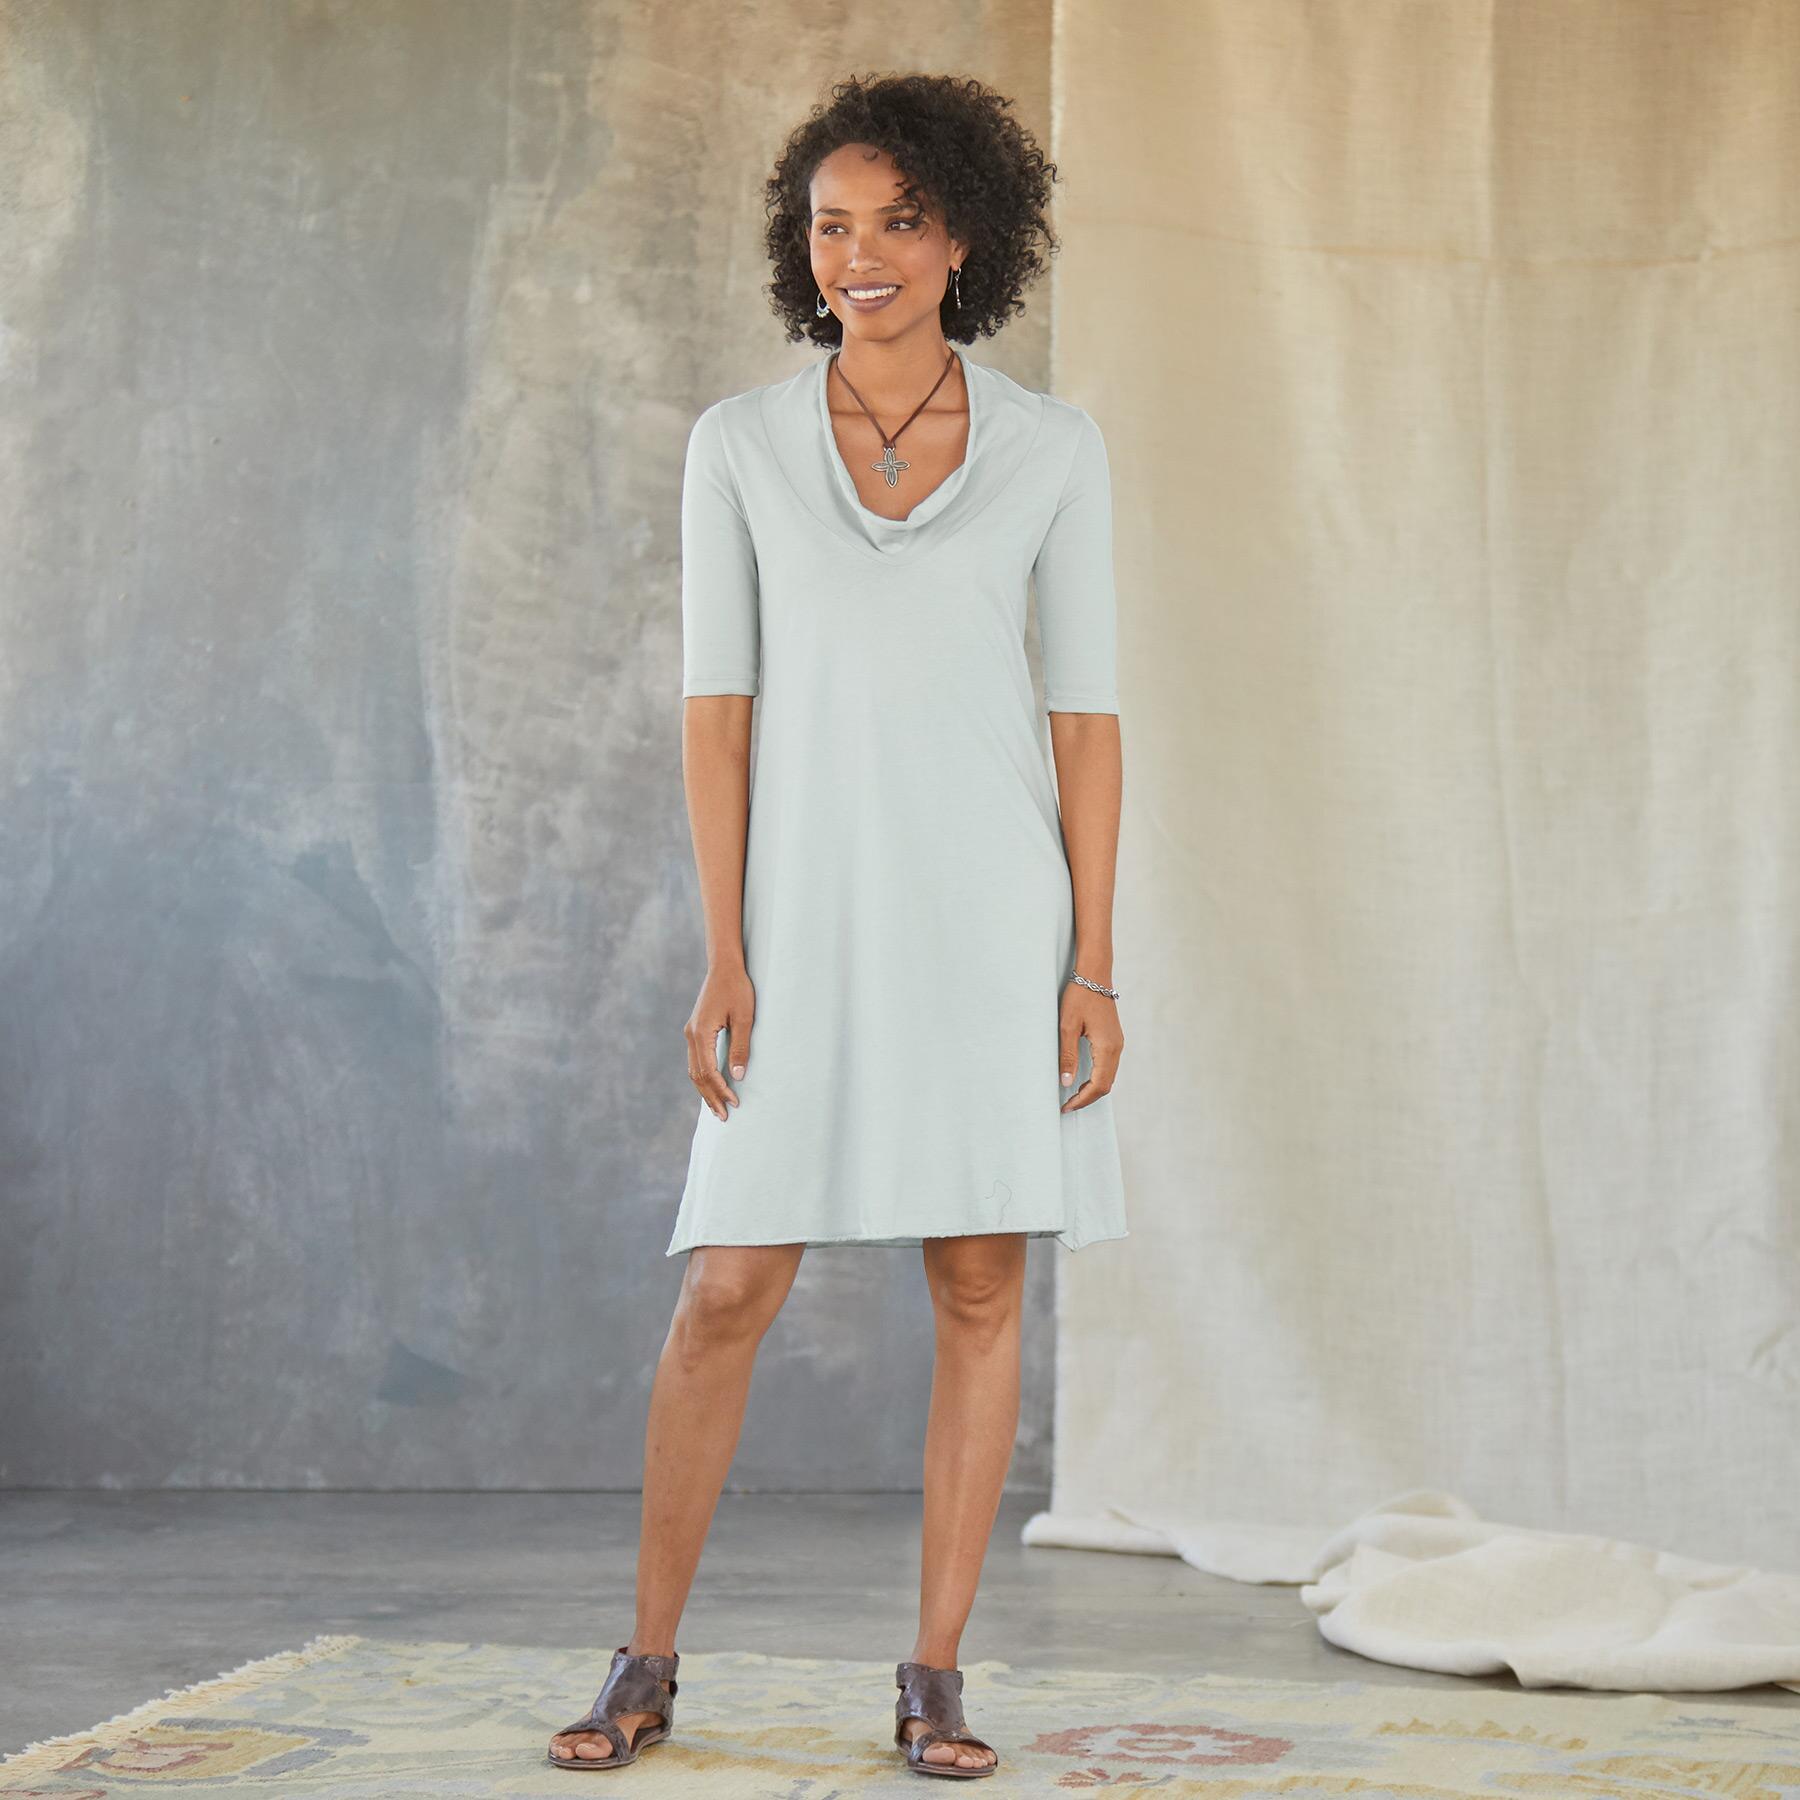 FALCONET DRESS: View 1